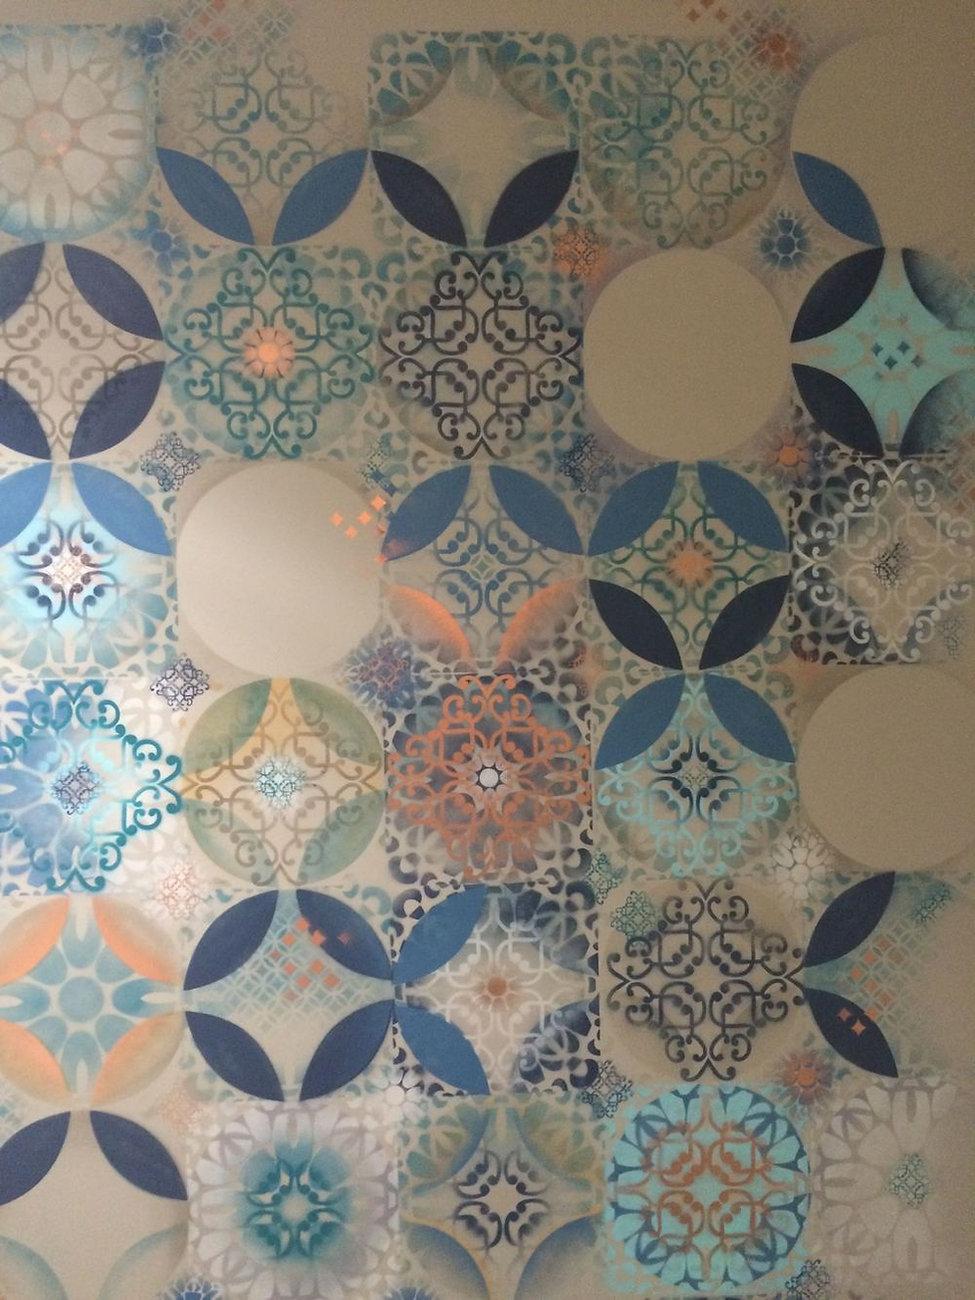 WakudaStudios_Murals_Tiles_7_CommercialD